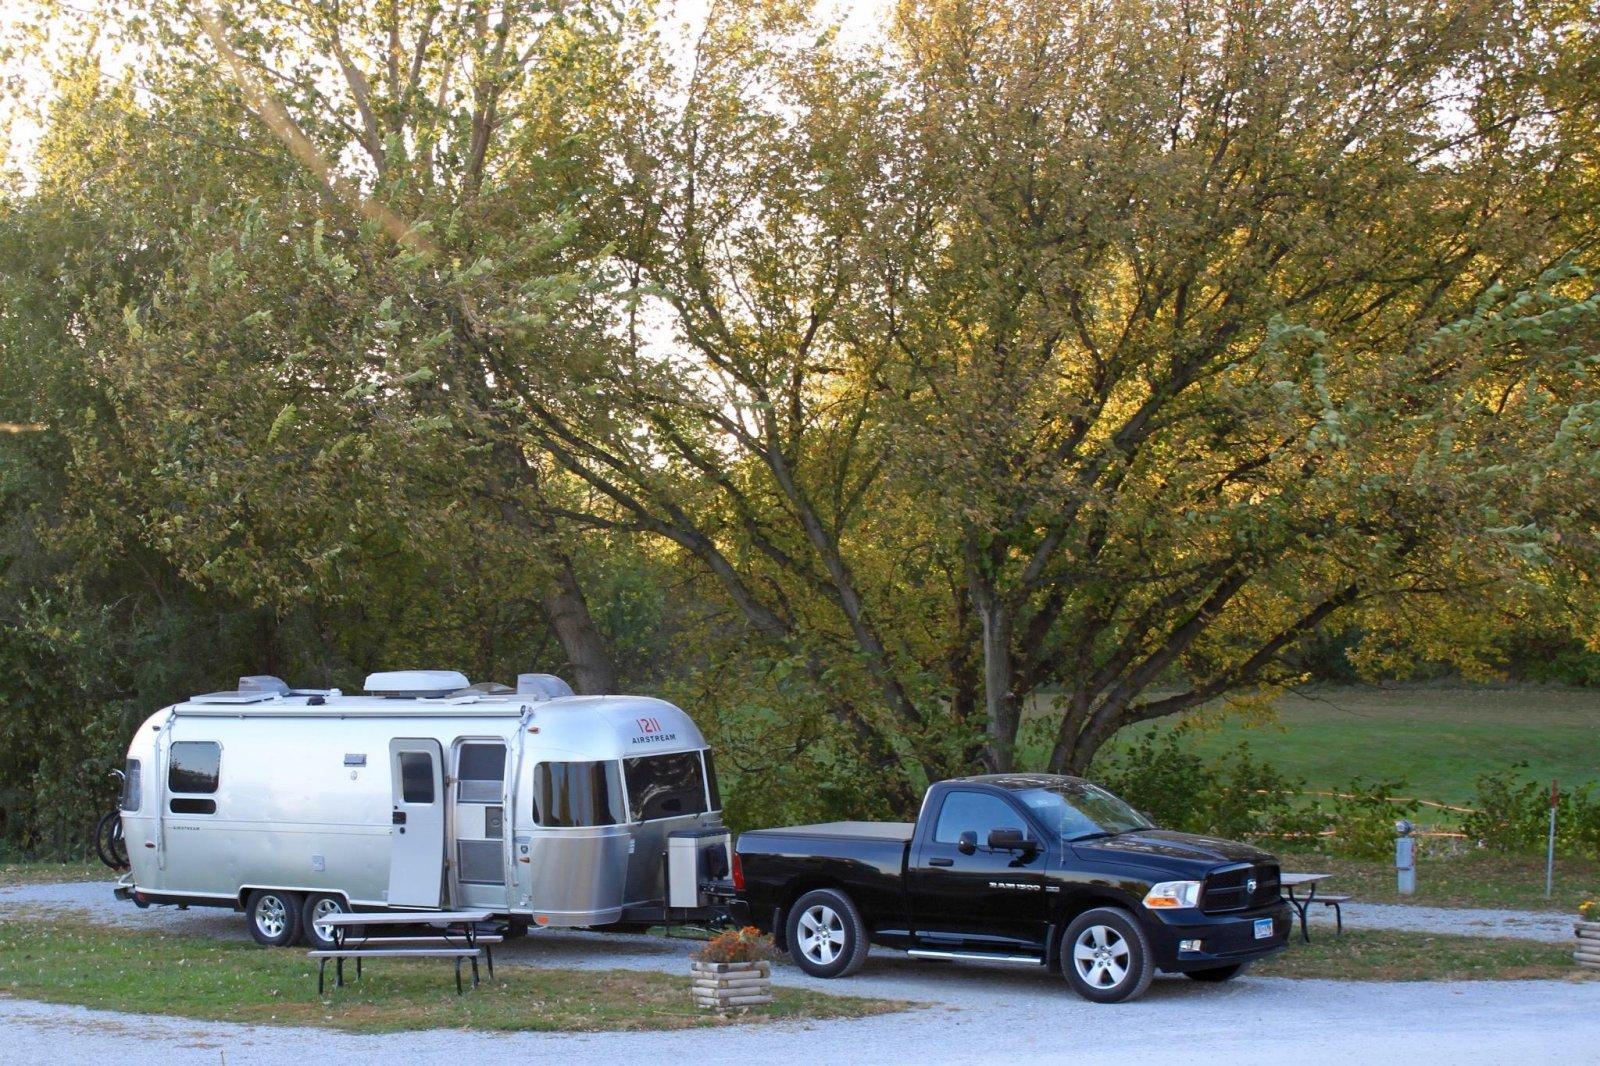 Click image for larger version  Name:Airstream:Nebraska.jpg Views:46 Size:499.6 KB ID:272852